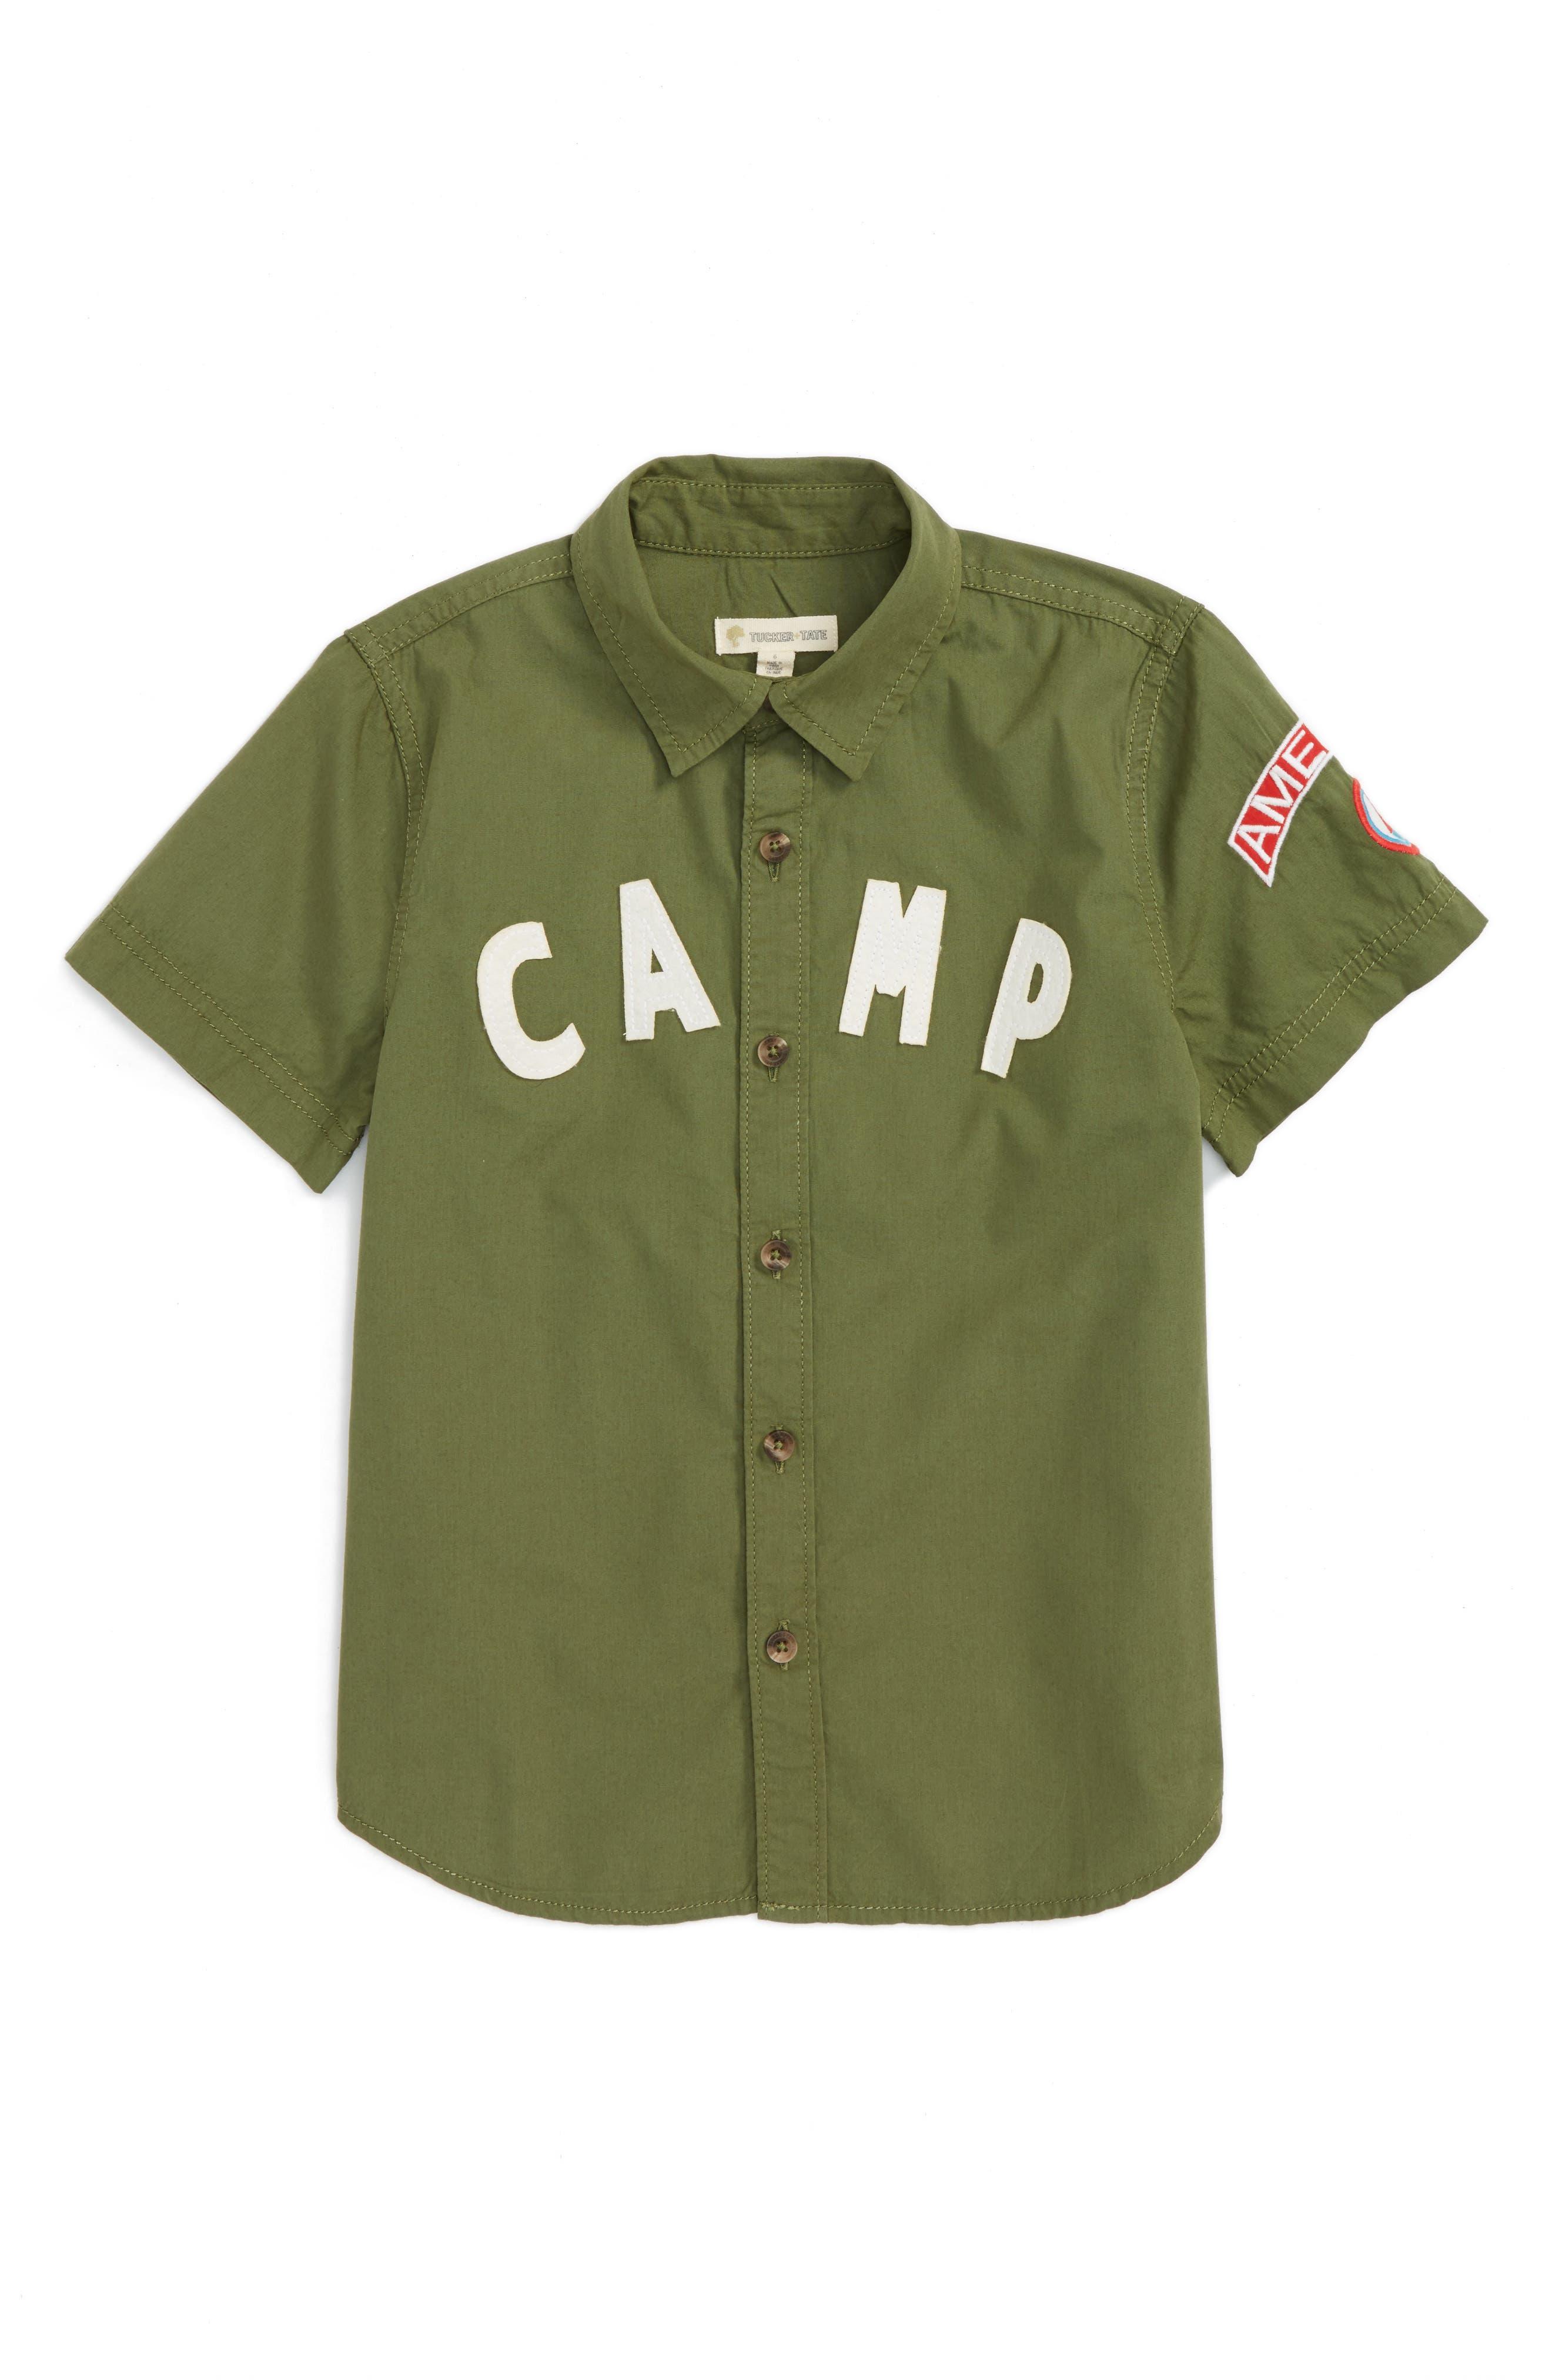 Alternate Image 1 Selected - Tucker + Tate Camp Shirt (Toddler Boys & Little Boys)